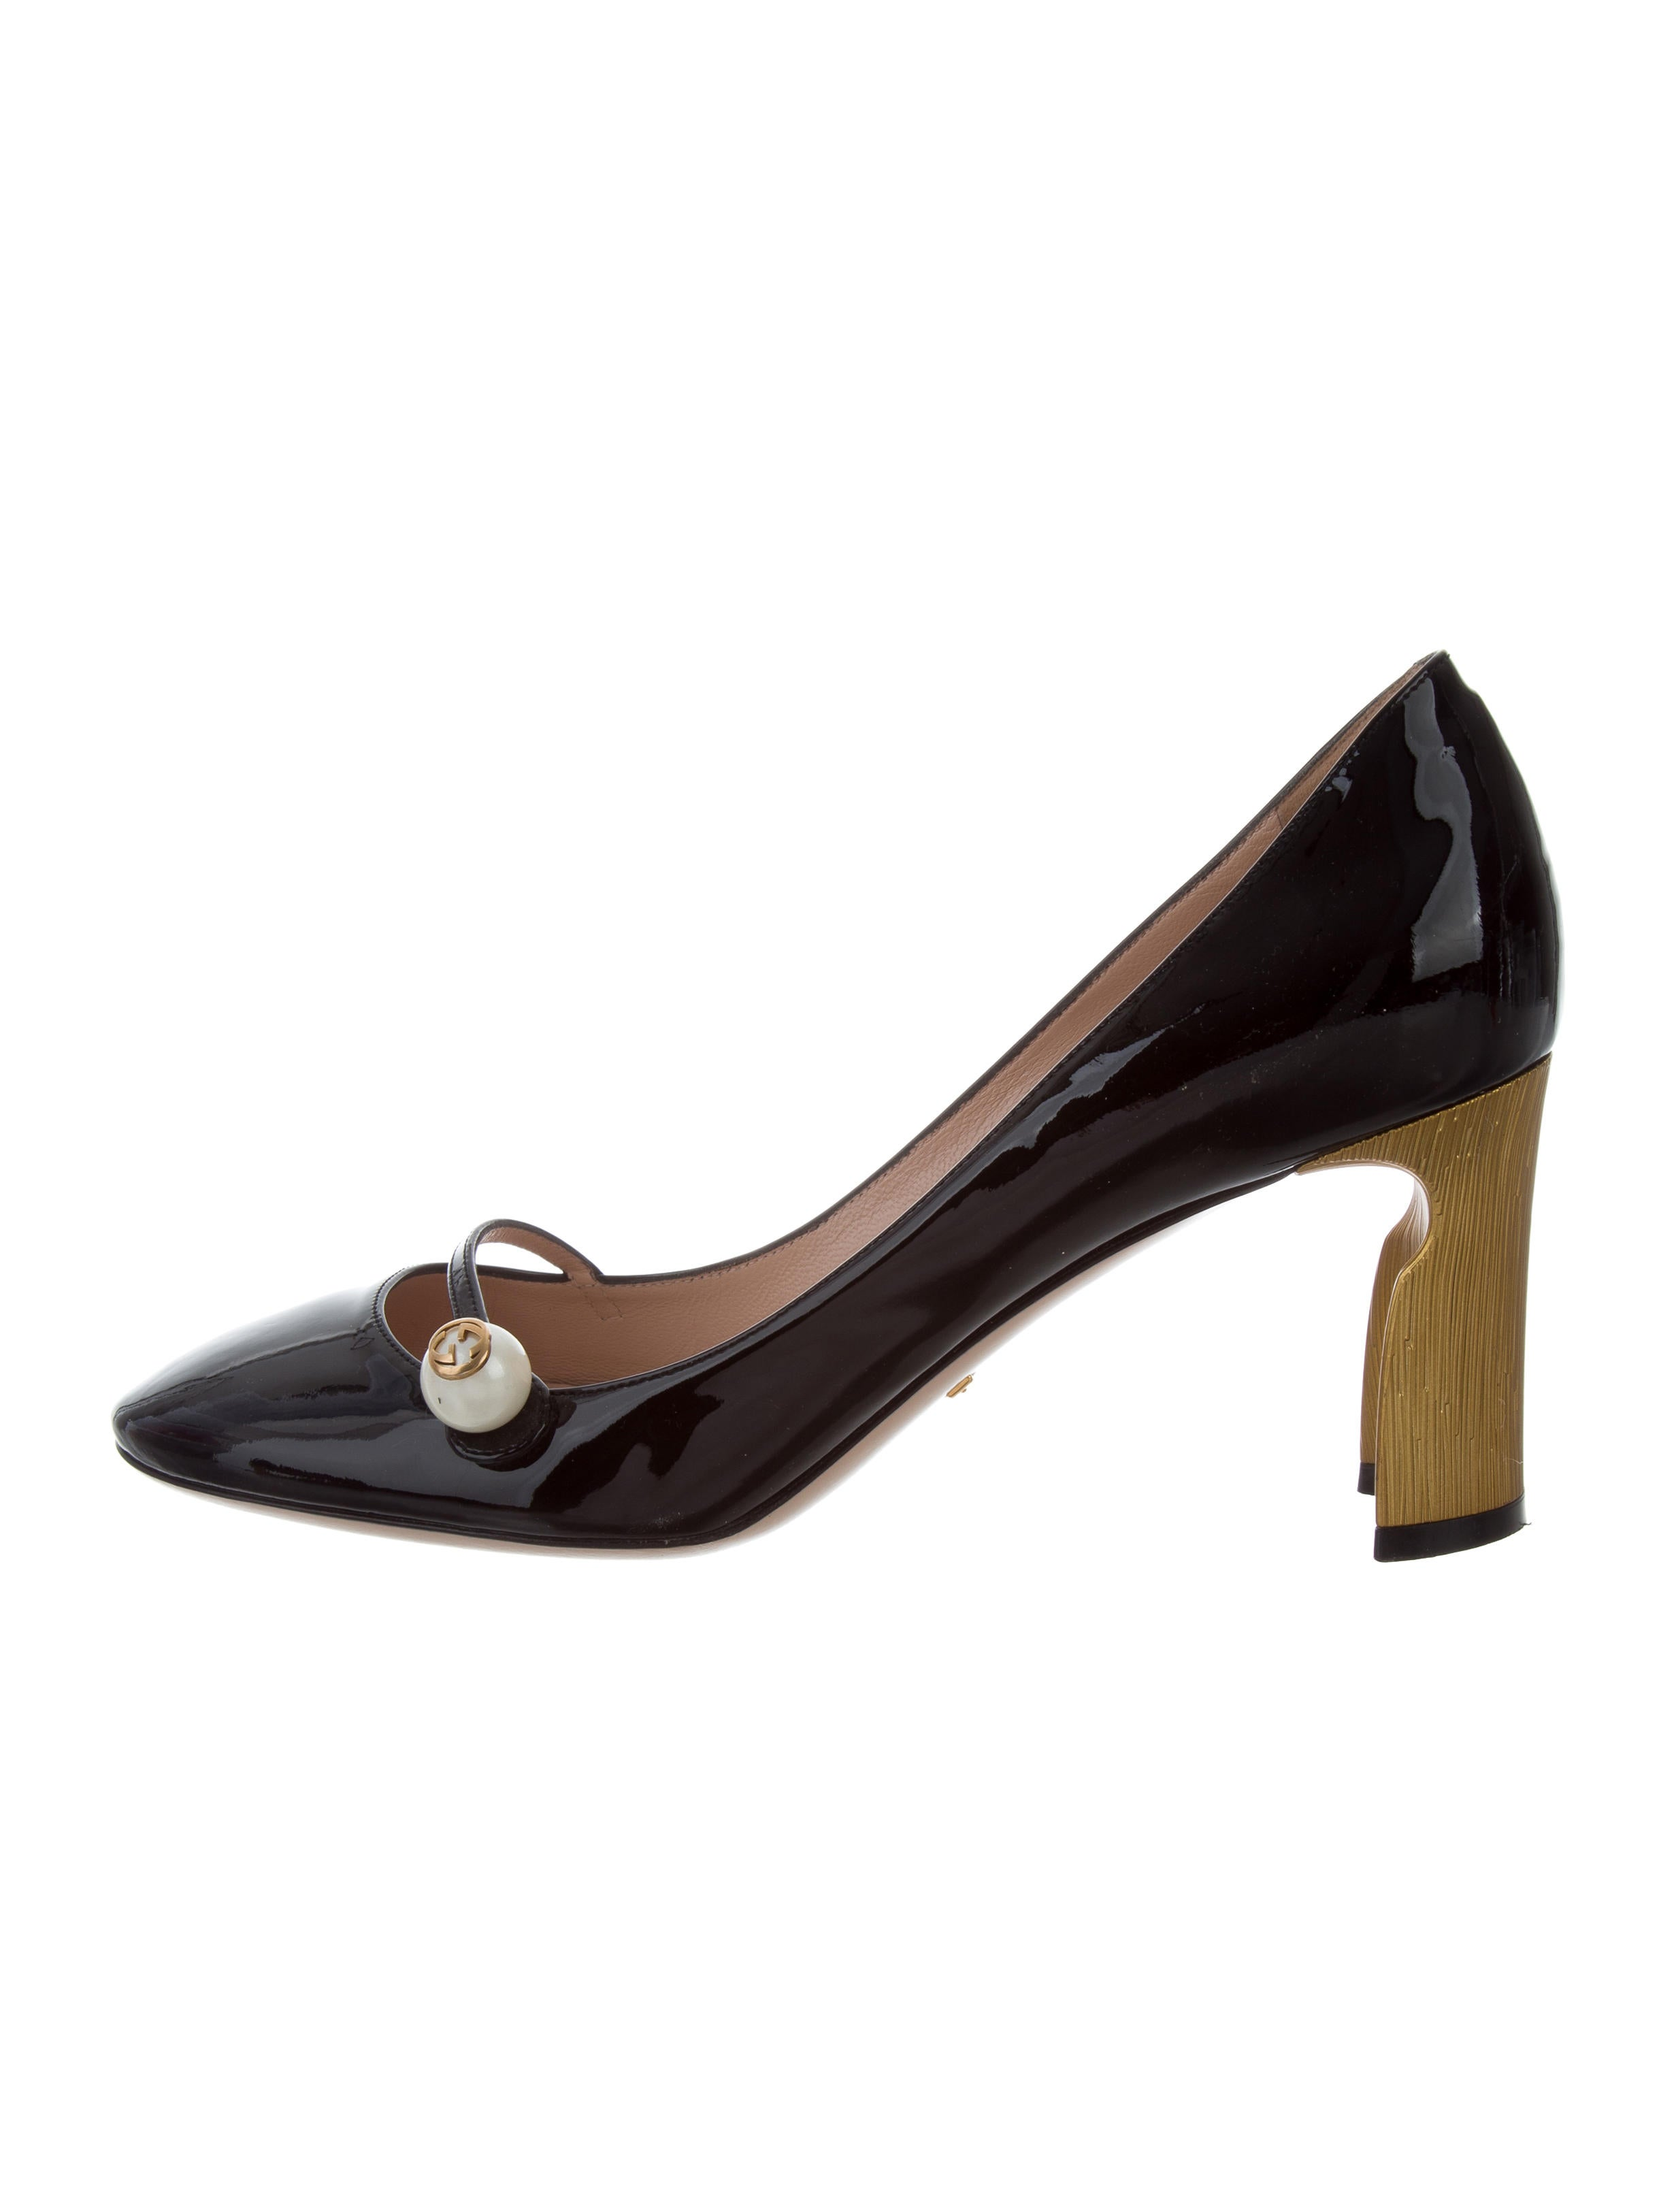 a9b16aaf42d9 Gucci Arielle Mary Jane Pumps - Shoes - GUC177655